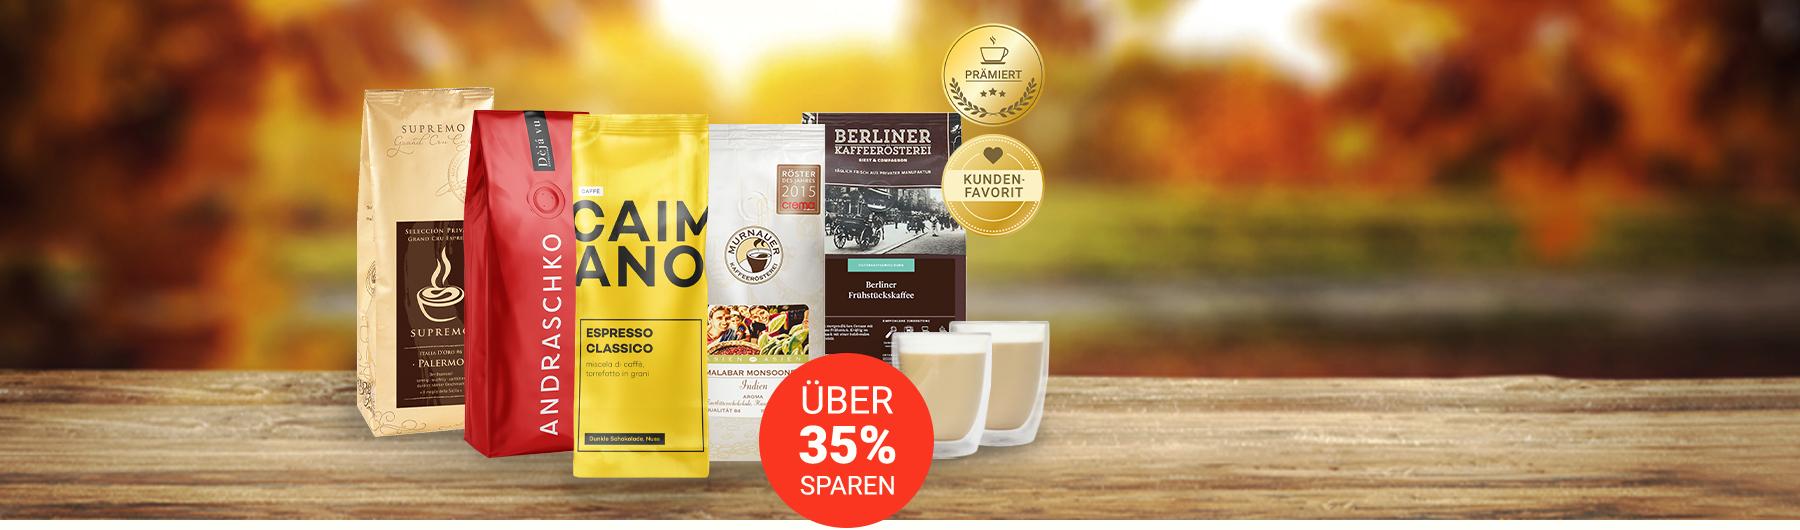 "TV Today Probierpaket ""Perfekter Cappuccino"""